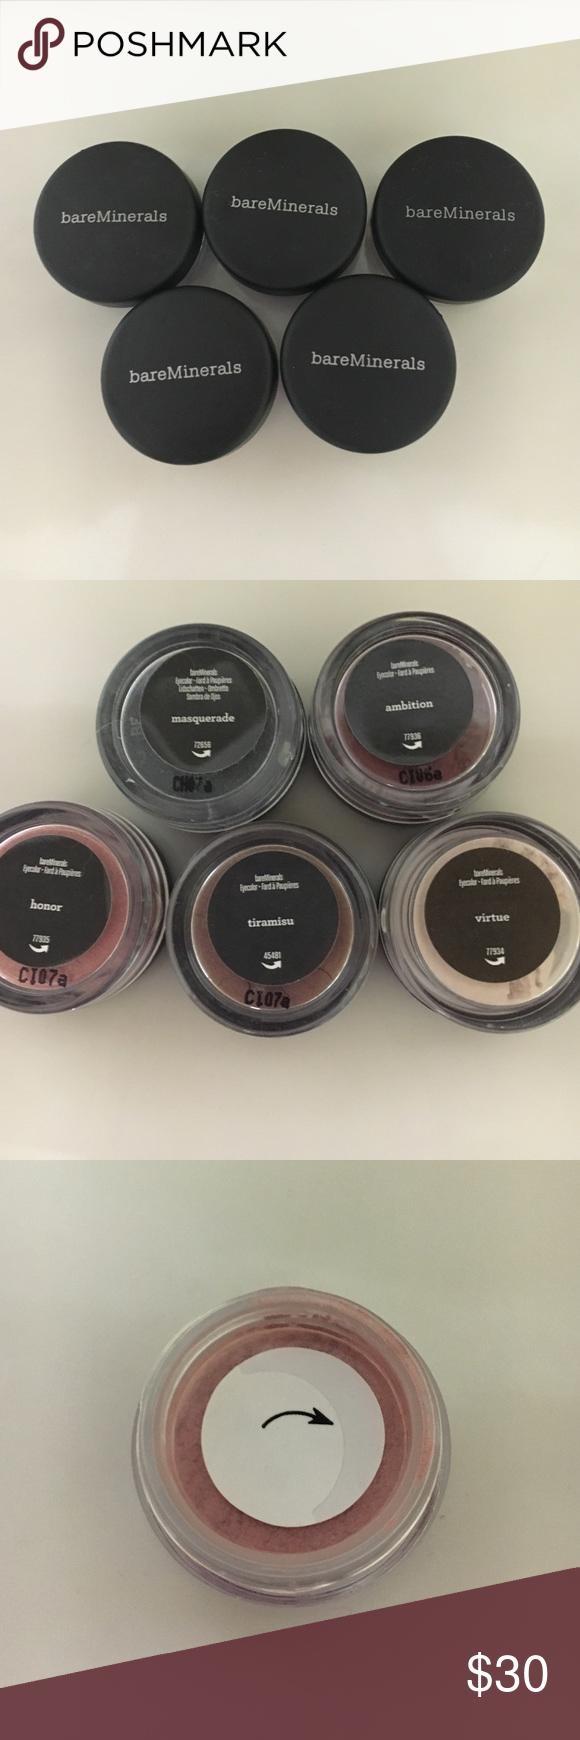 Bare Minerals set of 5 eyeshadows 5 brand new never opened Bare Minerals shades. Makeup Eyeshadow